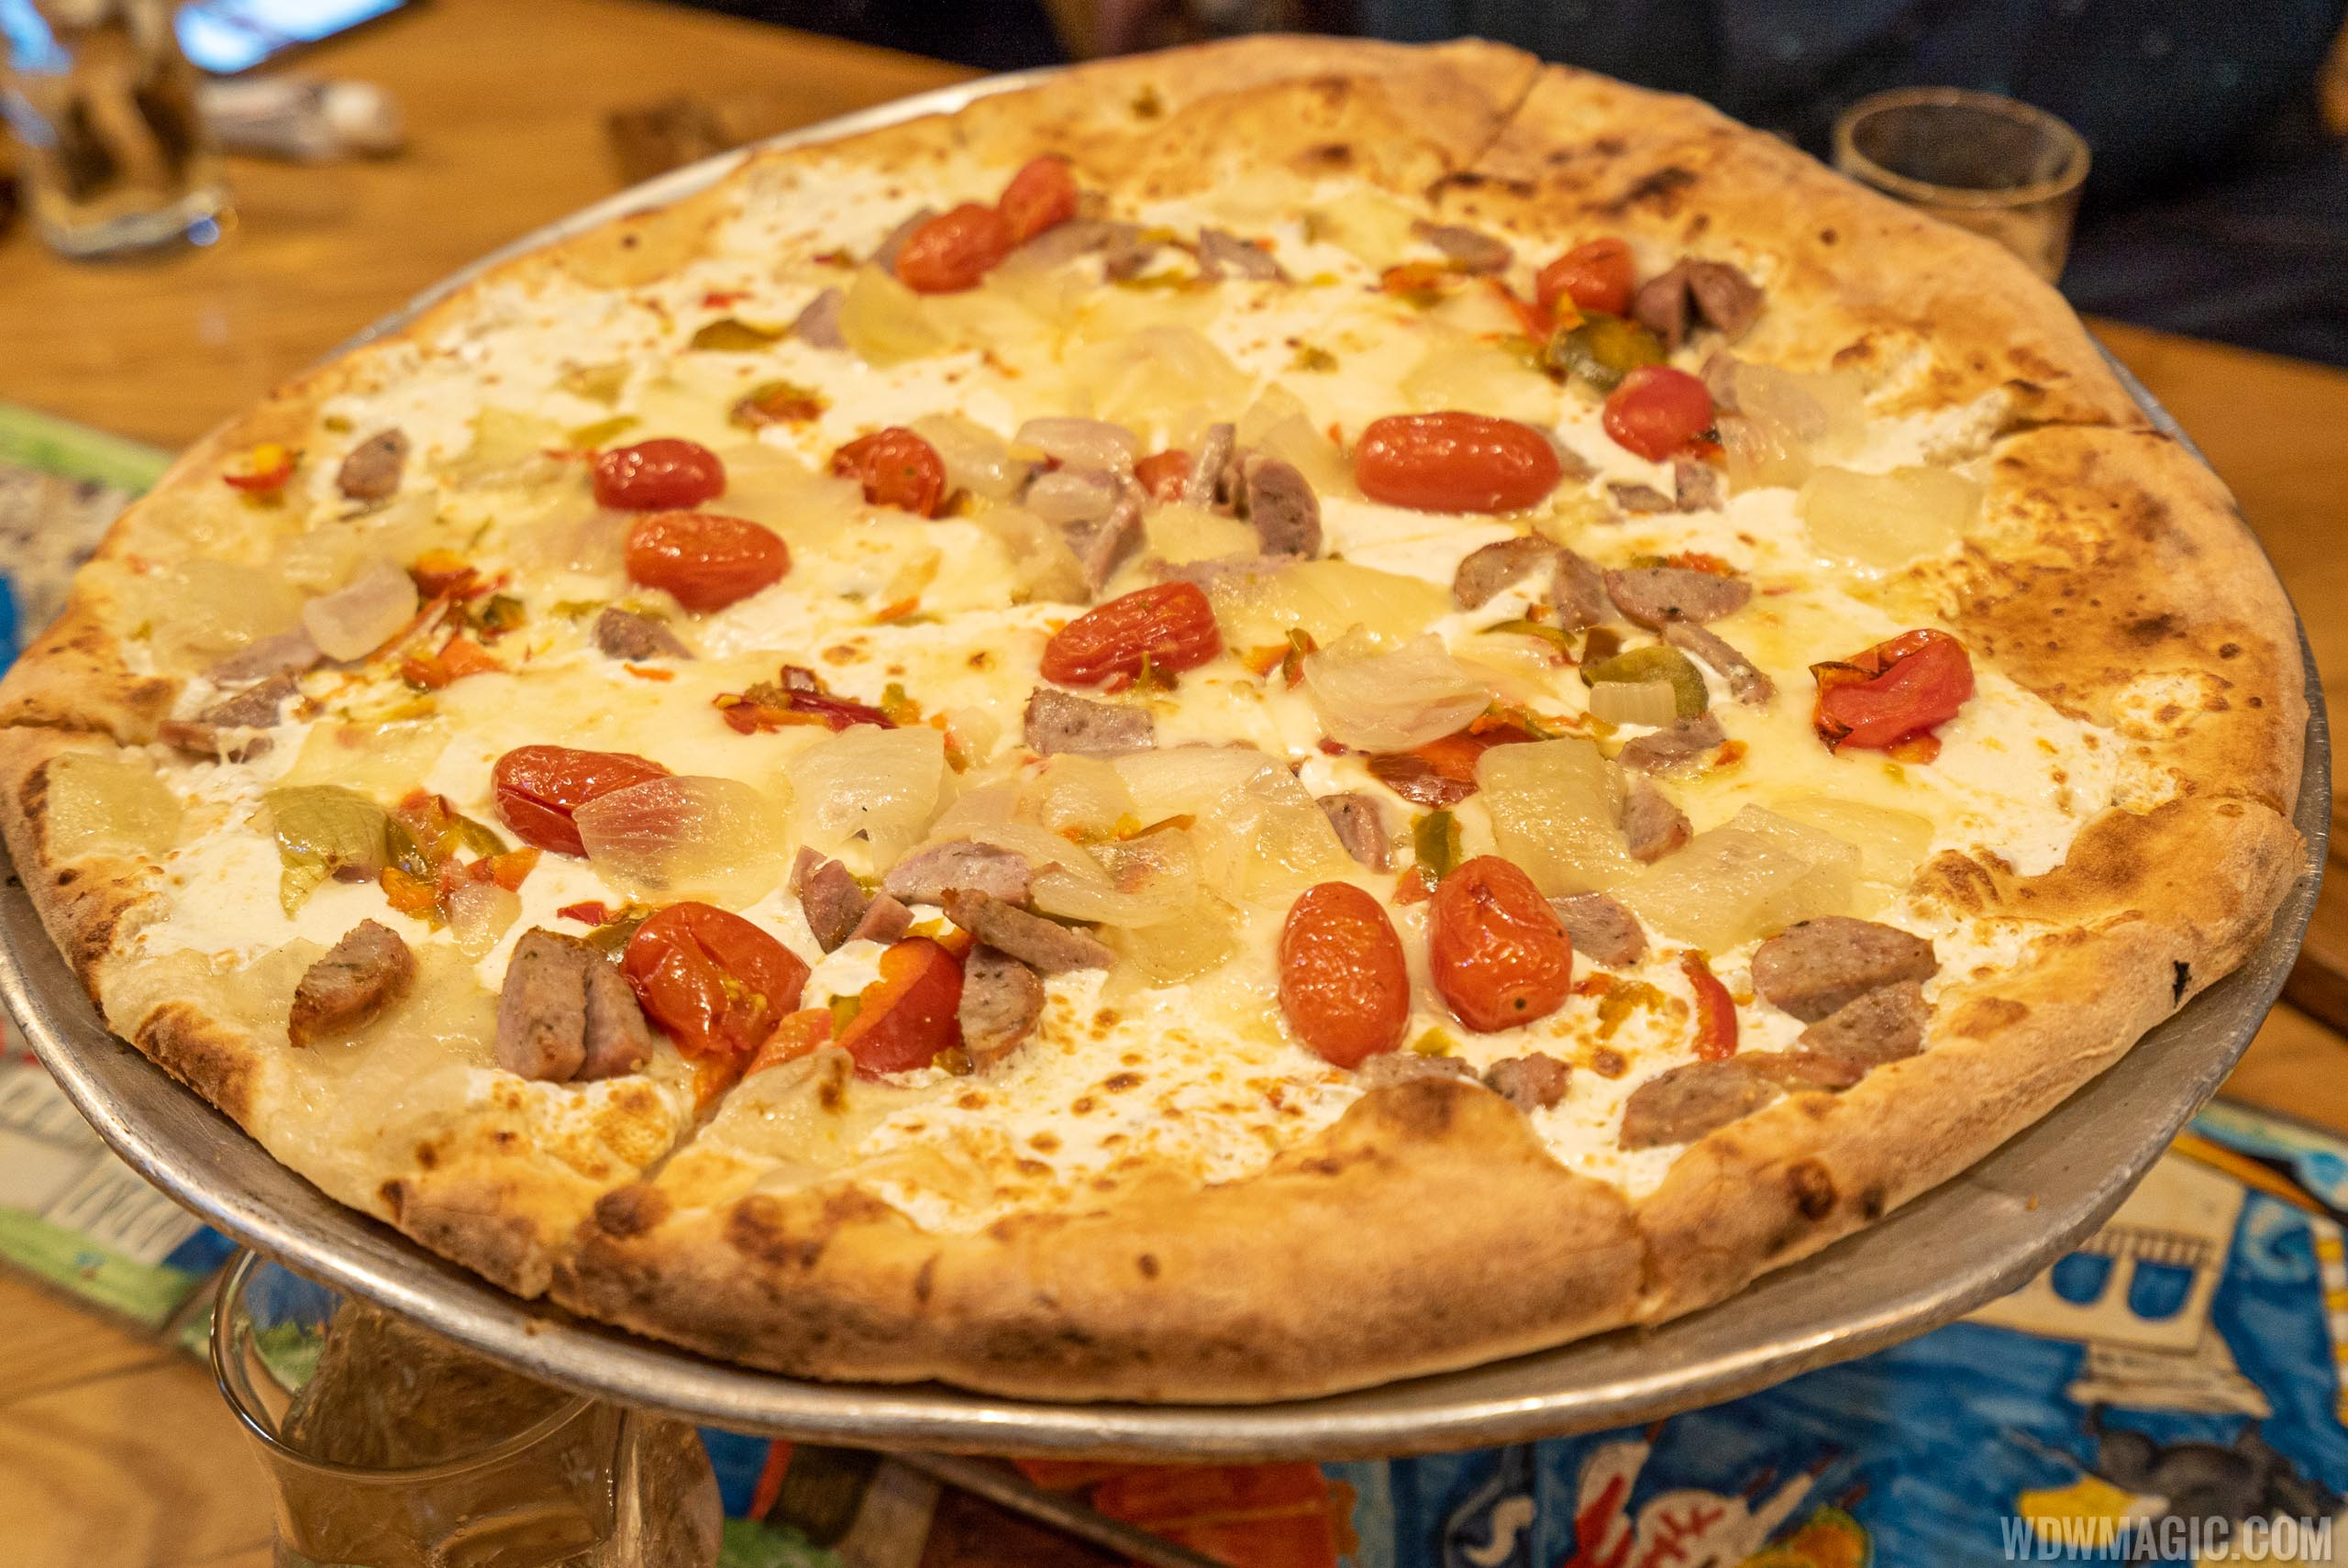 Via Napoli San Gennaro Pizza - Mozzarella, fontina, sweet Italian sausage, cherry peppers, onions, tomato